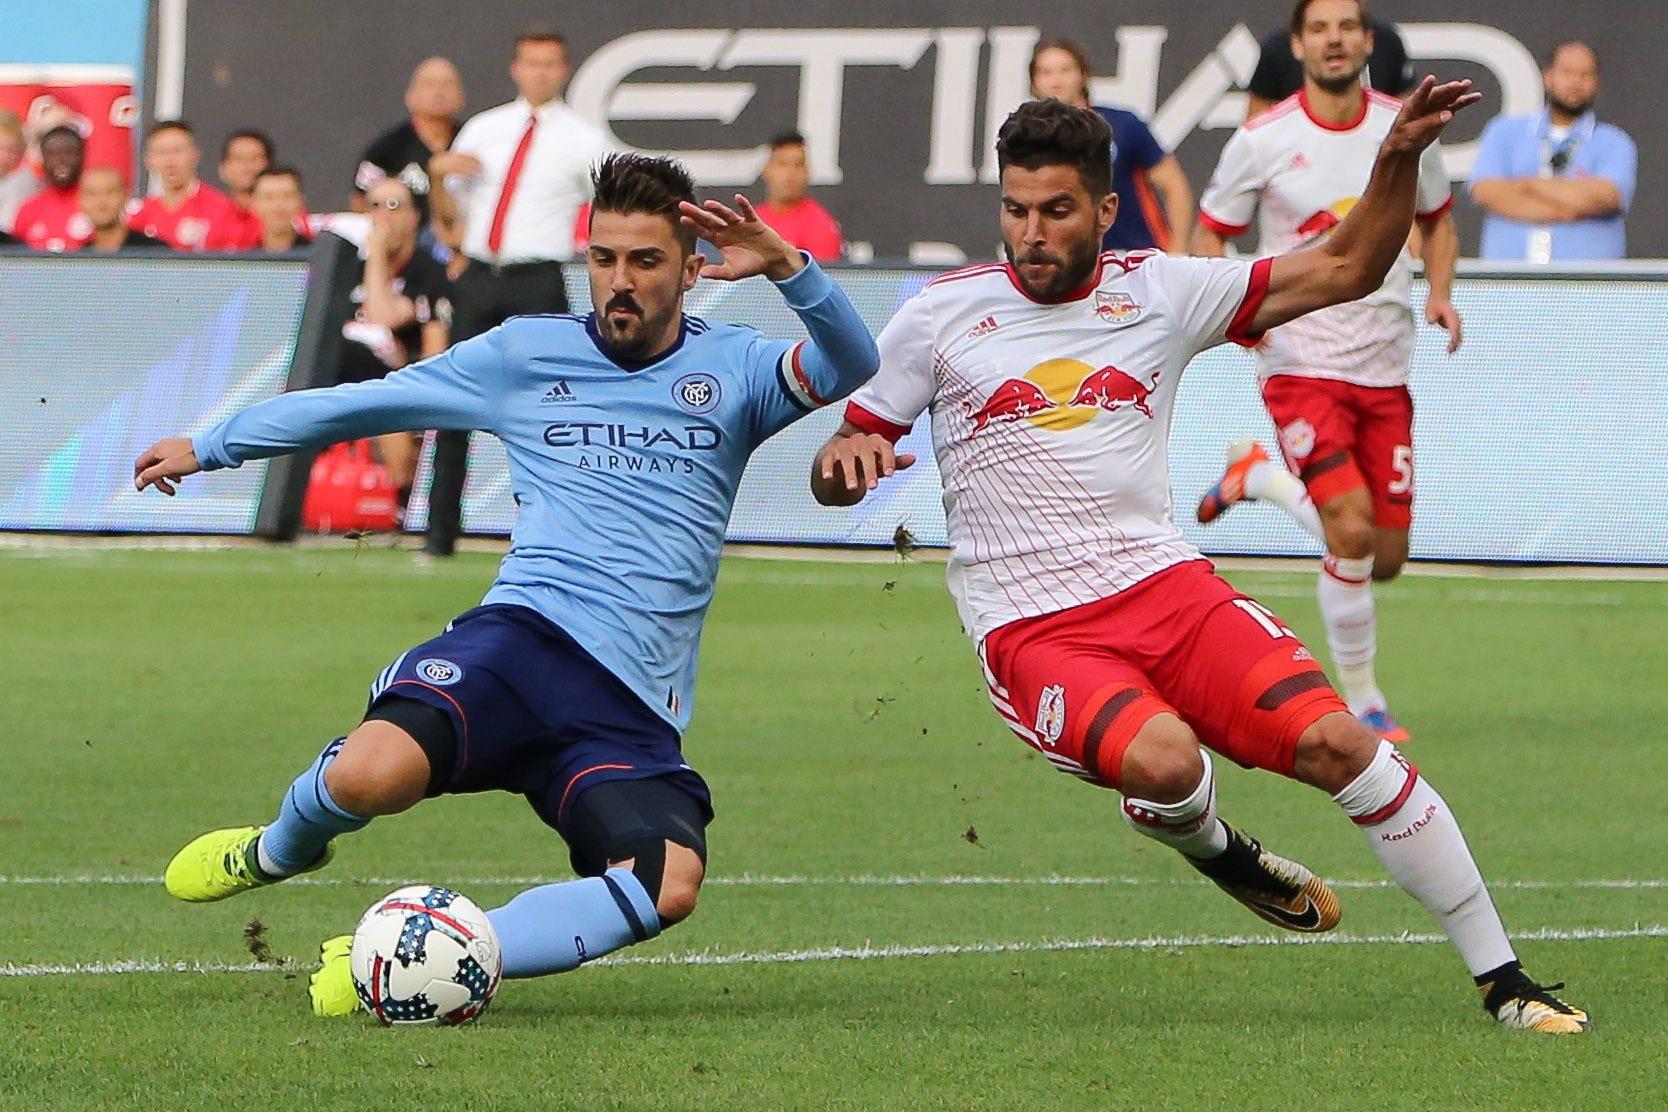 David Villa outduels Bradley Wright-Phillips as NYCFC beats Red Bulls